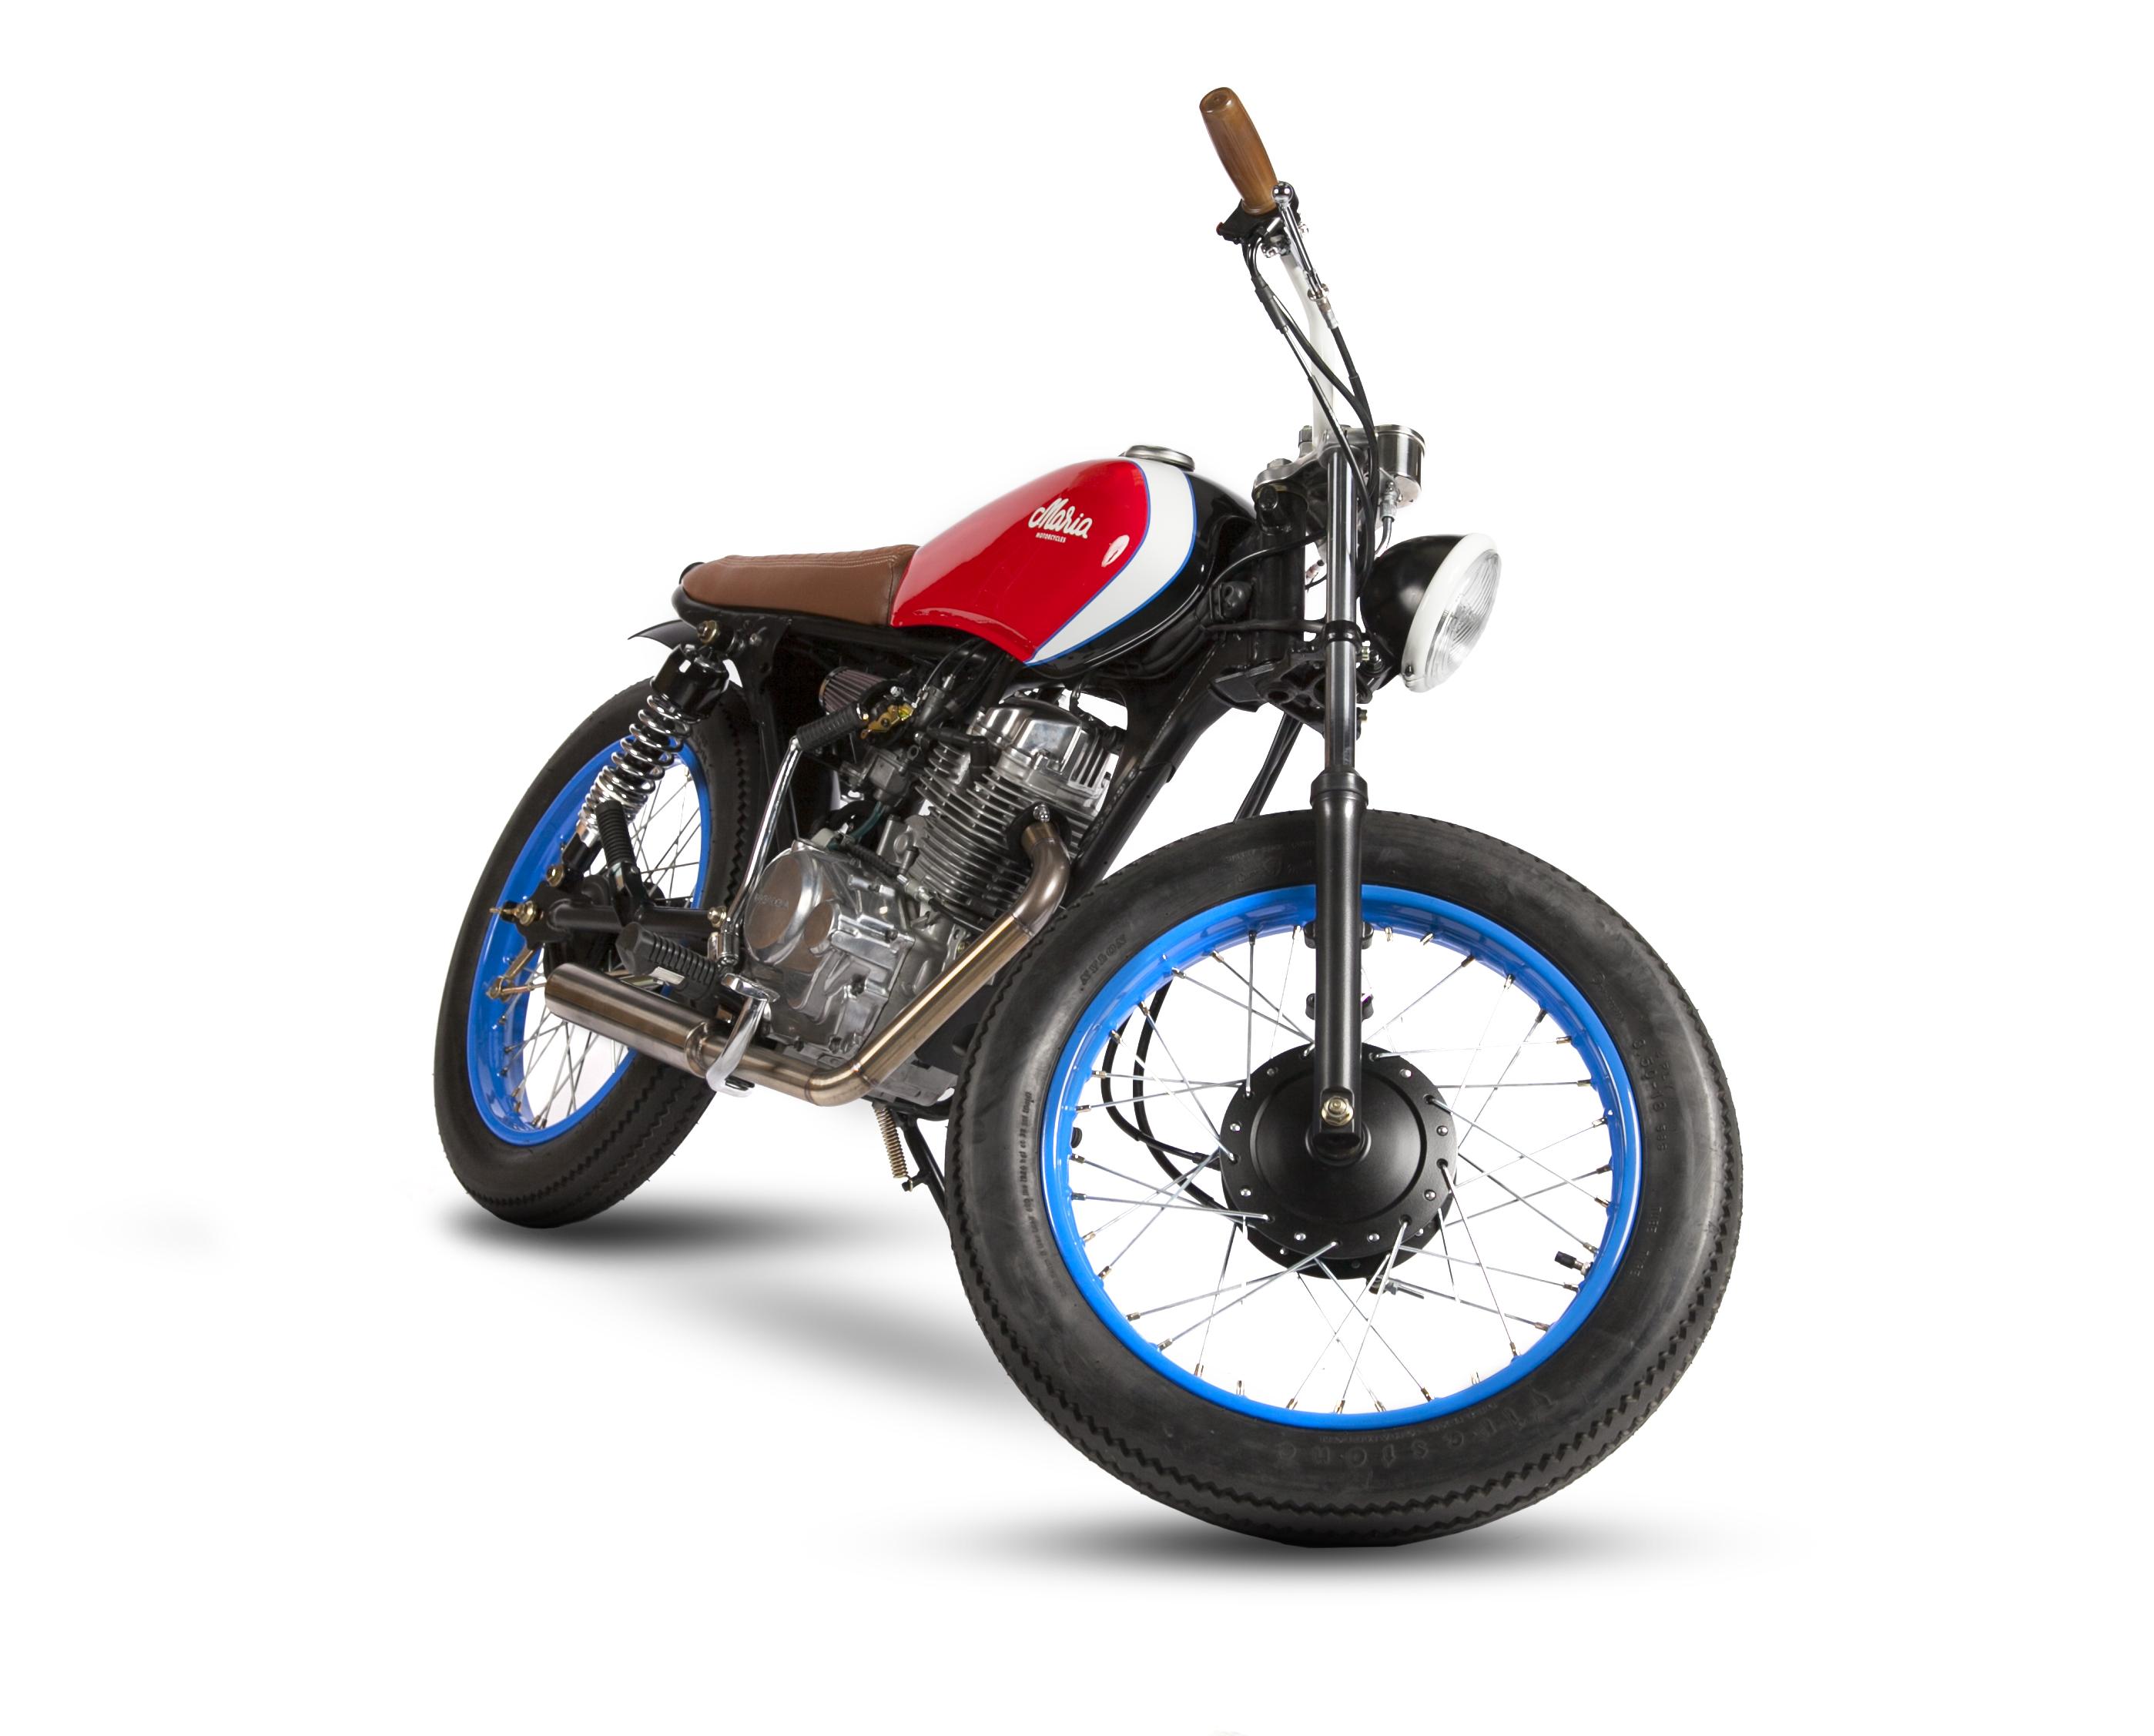 maria_motorcycles_honda_cg125_beladonna_3794